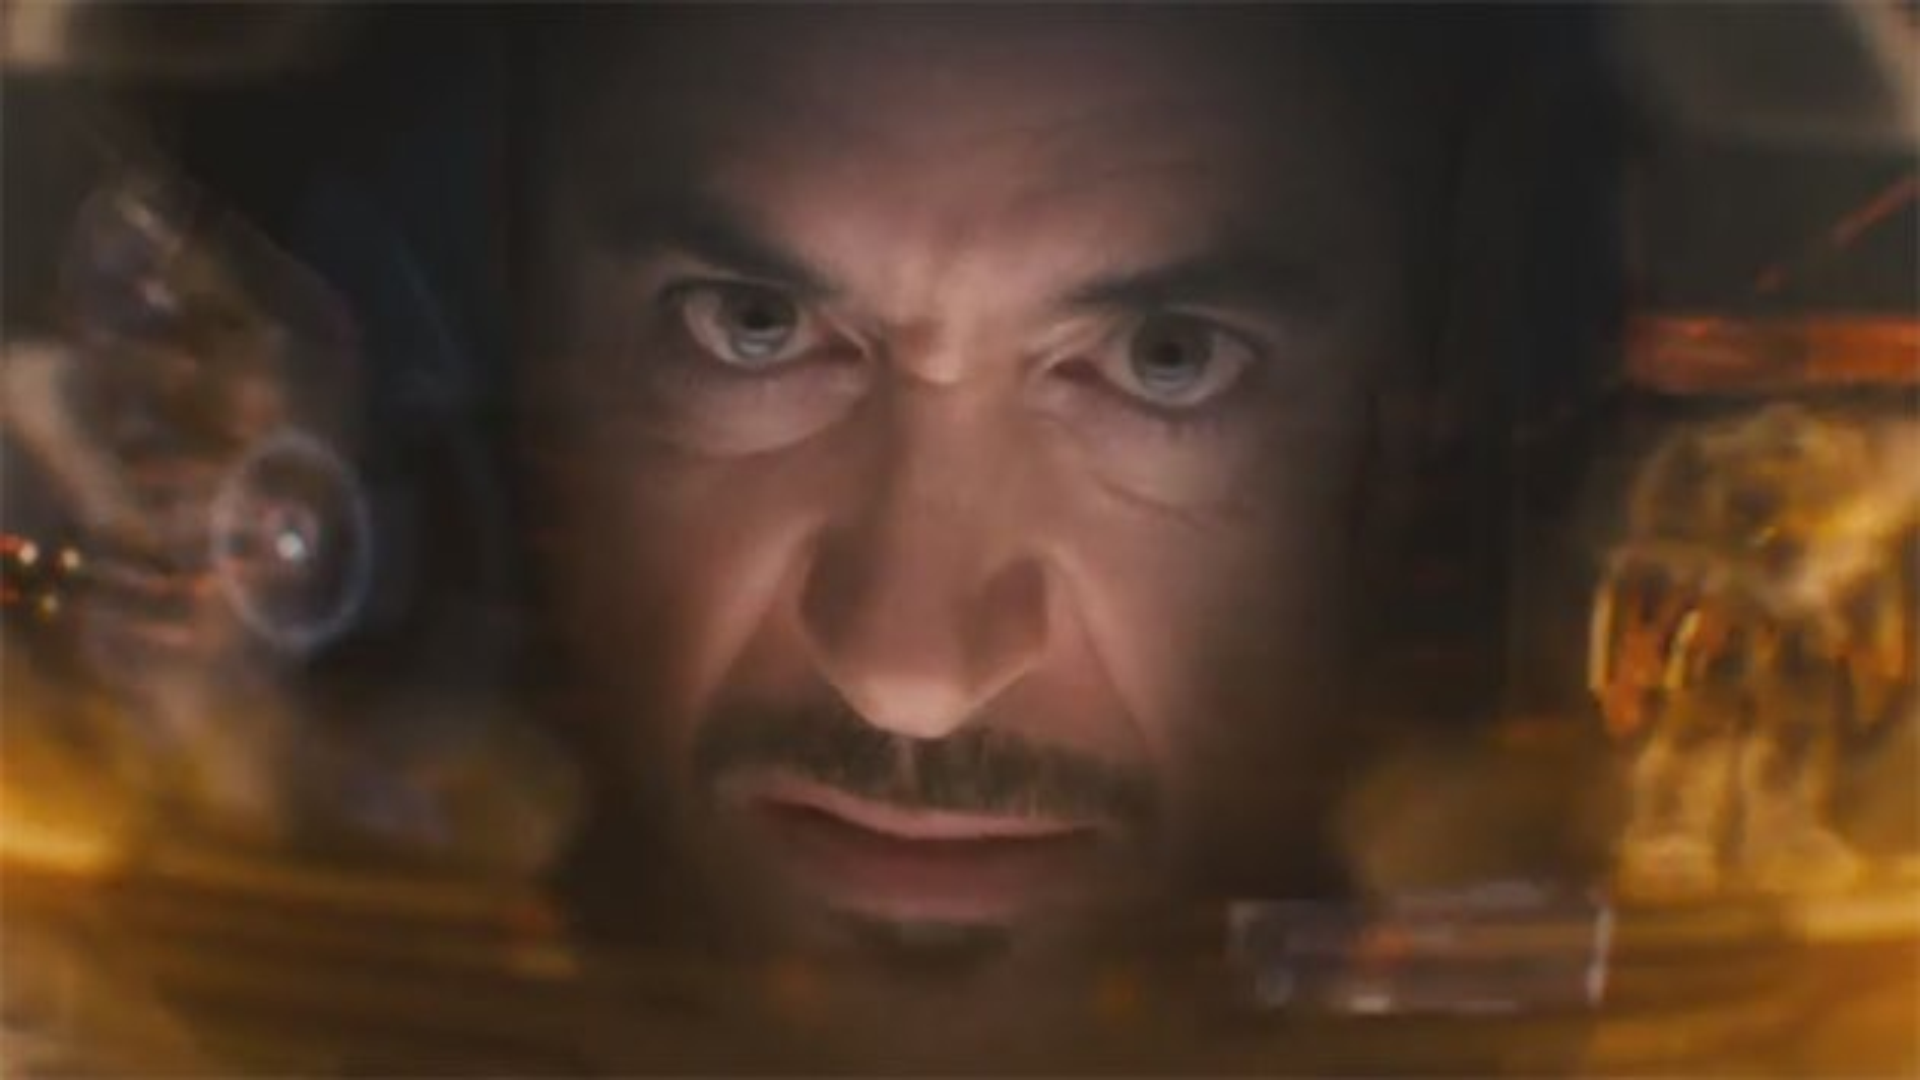 Avengers-Age-of-Ultron-Robert-Downey-Jr-Iron-Man